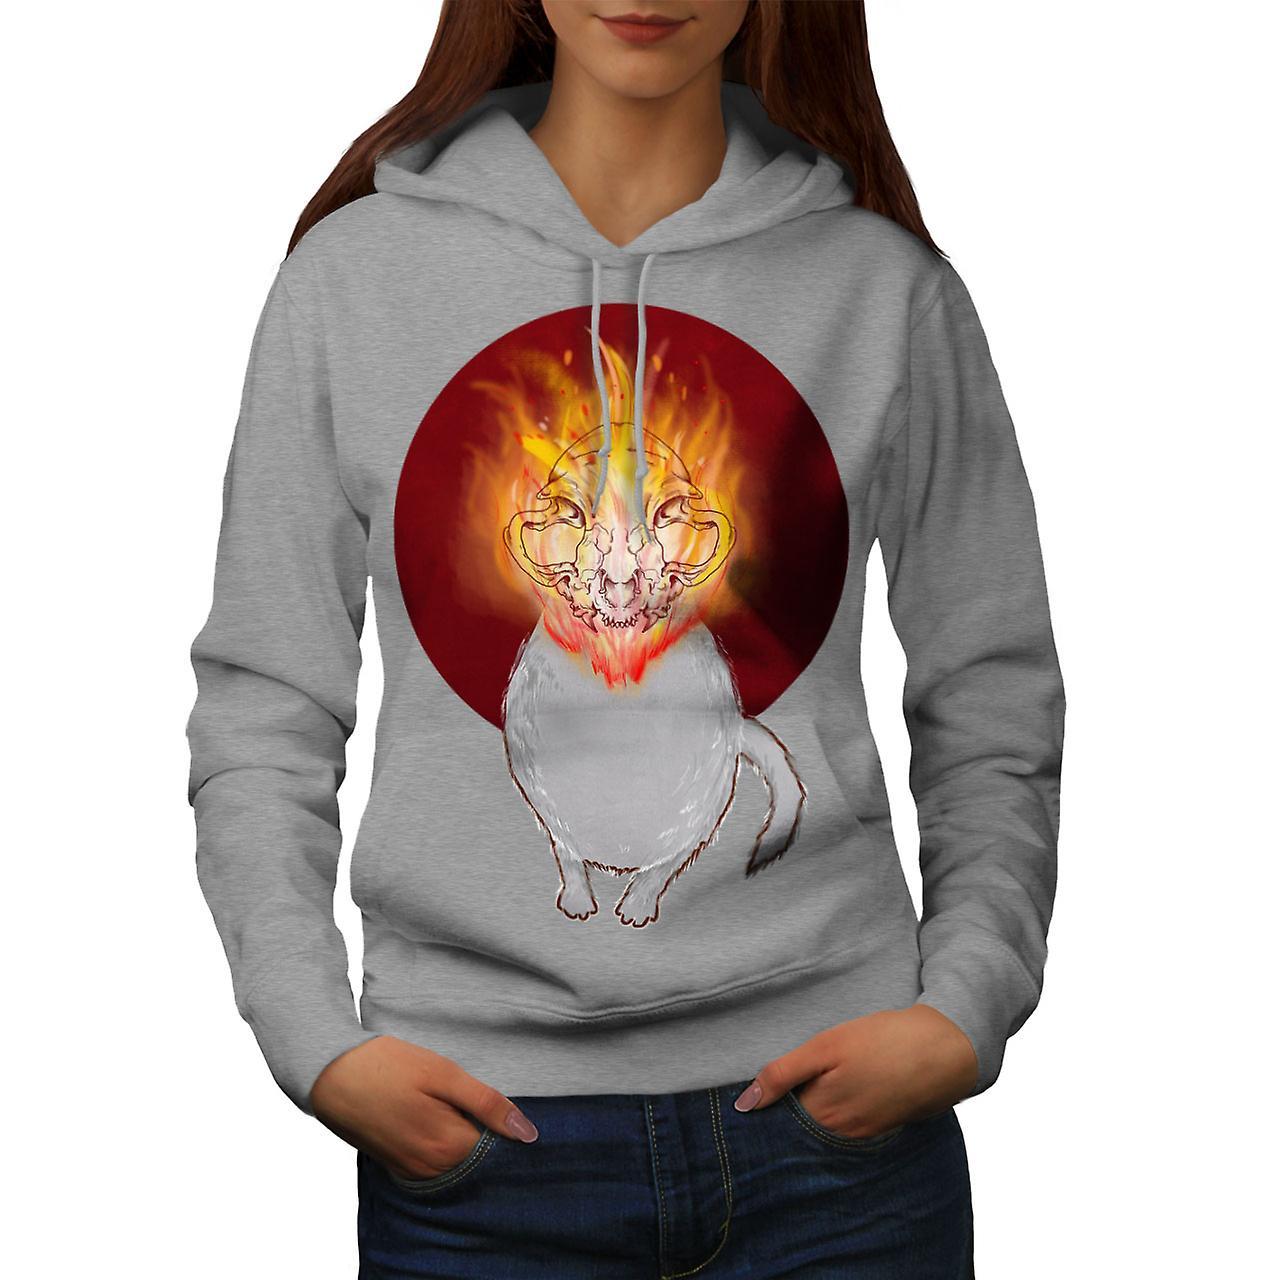 L'enfer Satan chat Animal femmes grisHoodie